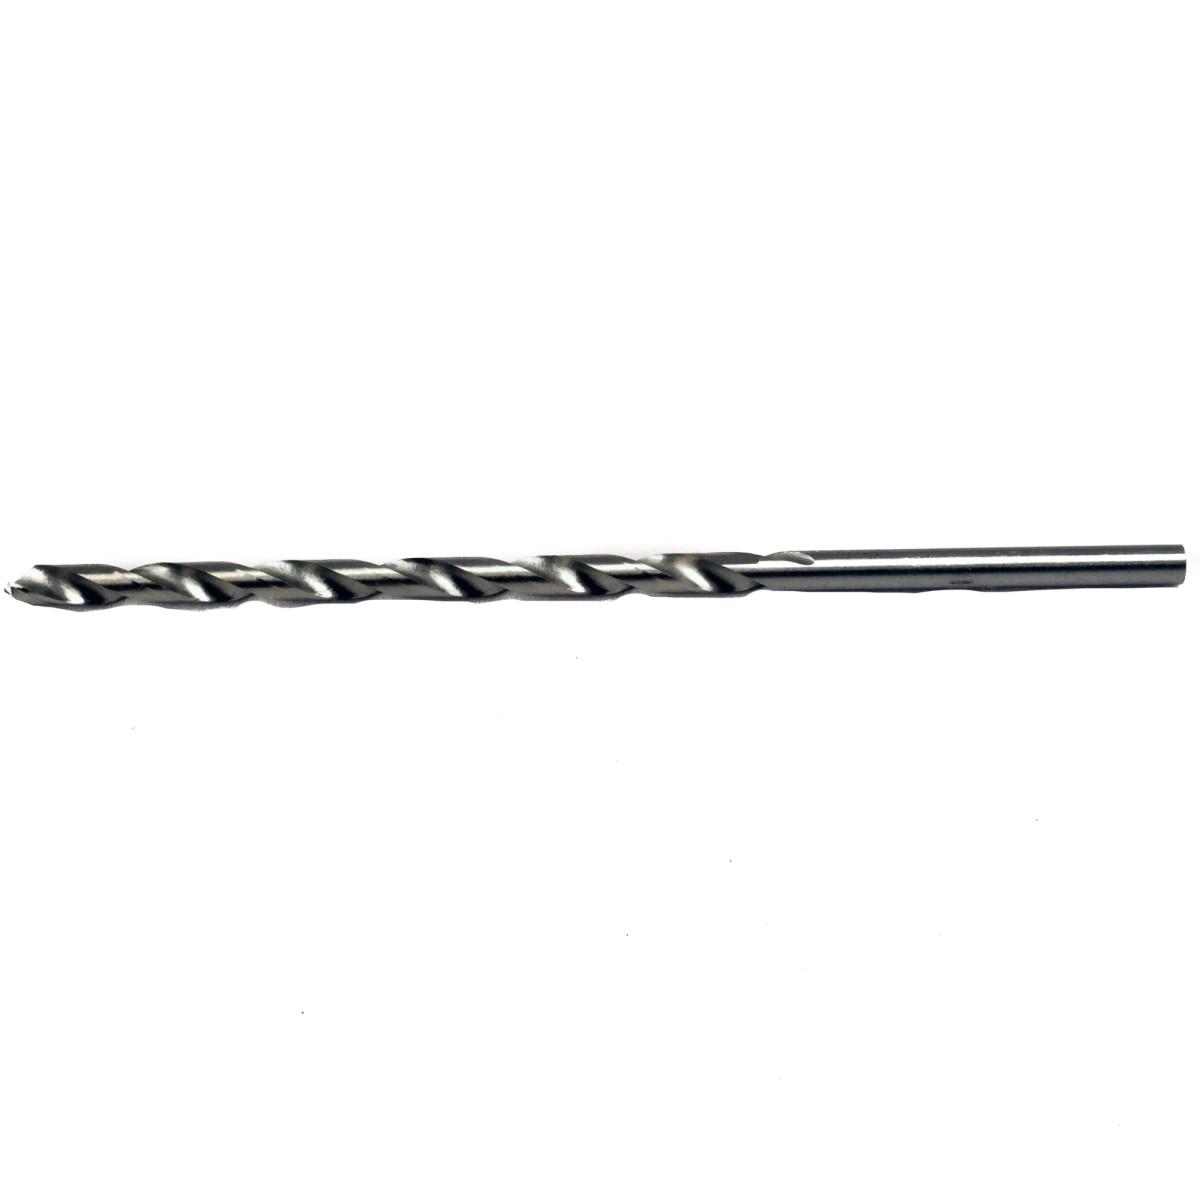 Сверло по металлу Практика Профи 42х119 мм удлиненное блистер 774-733